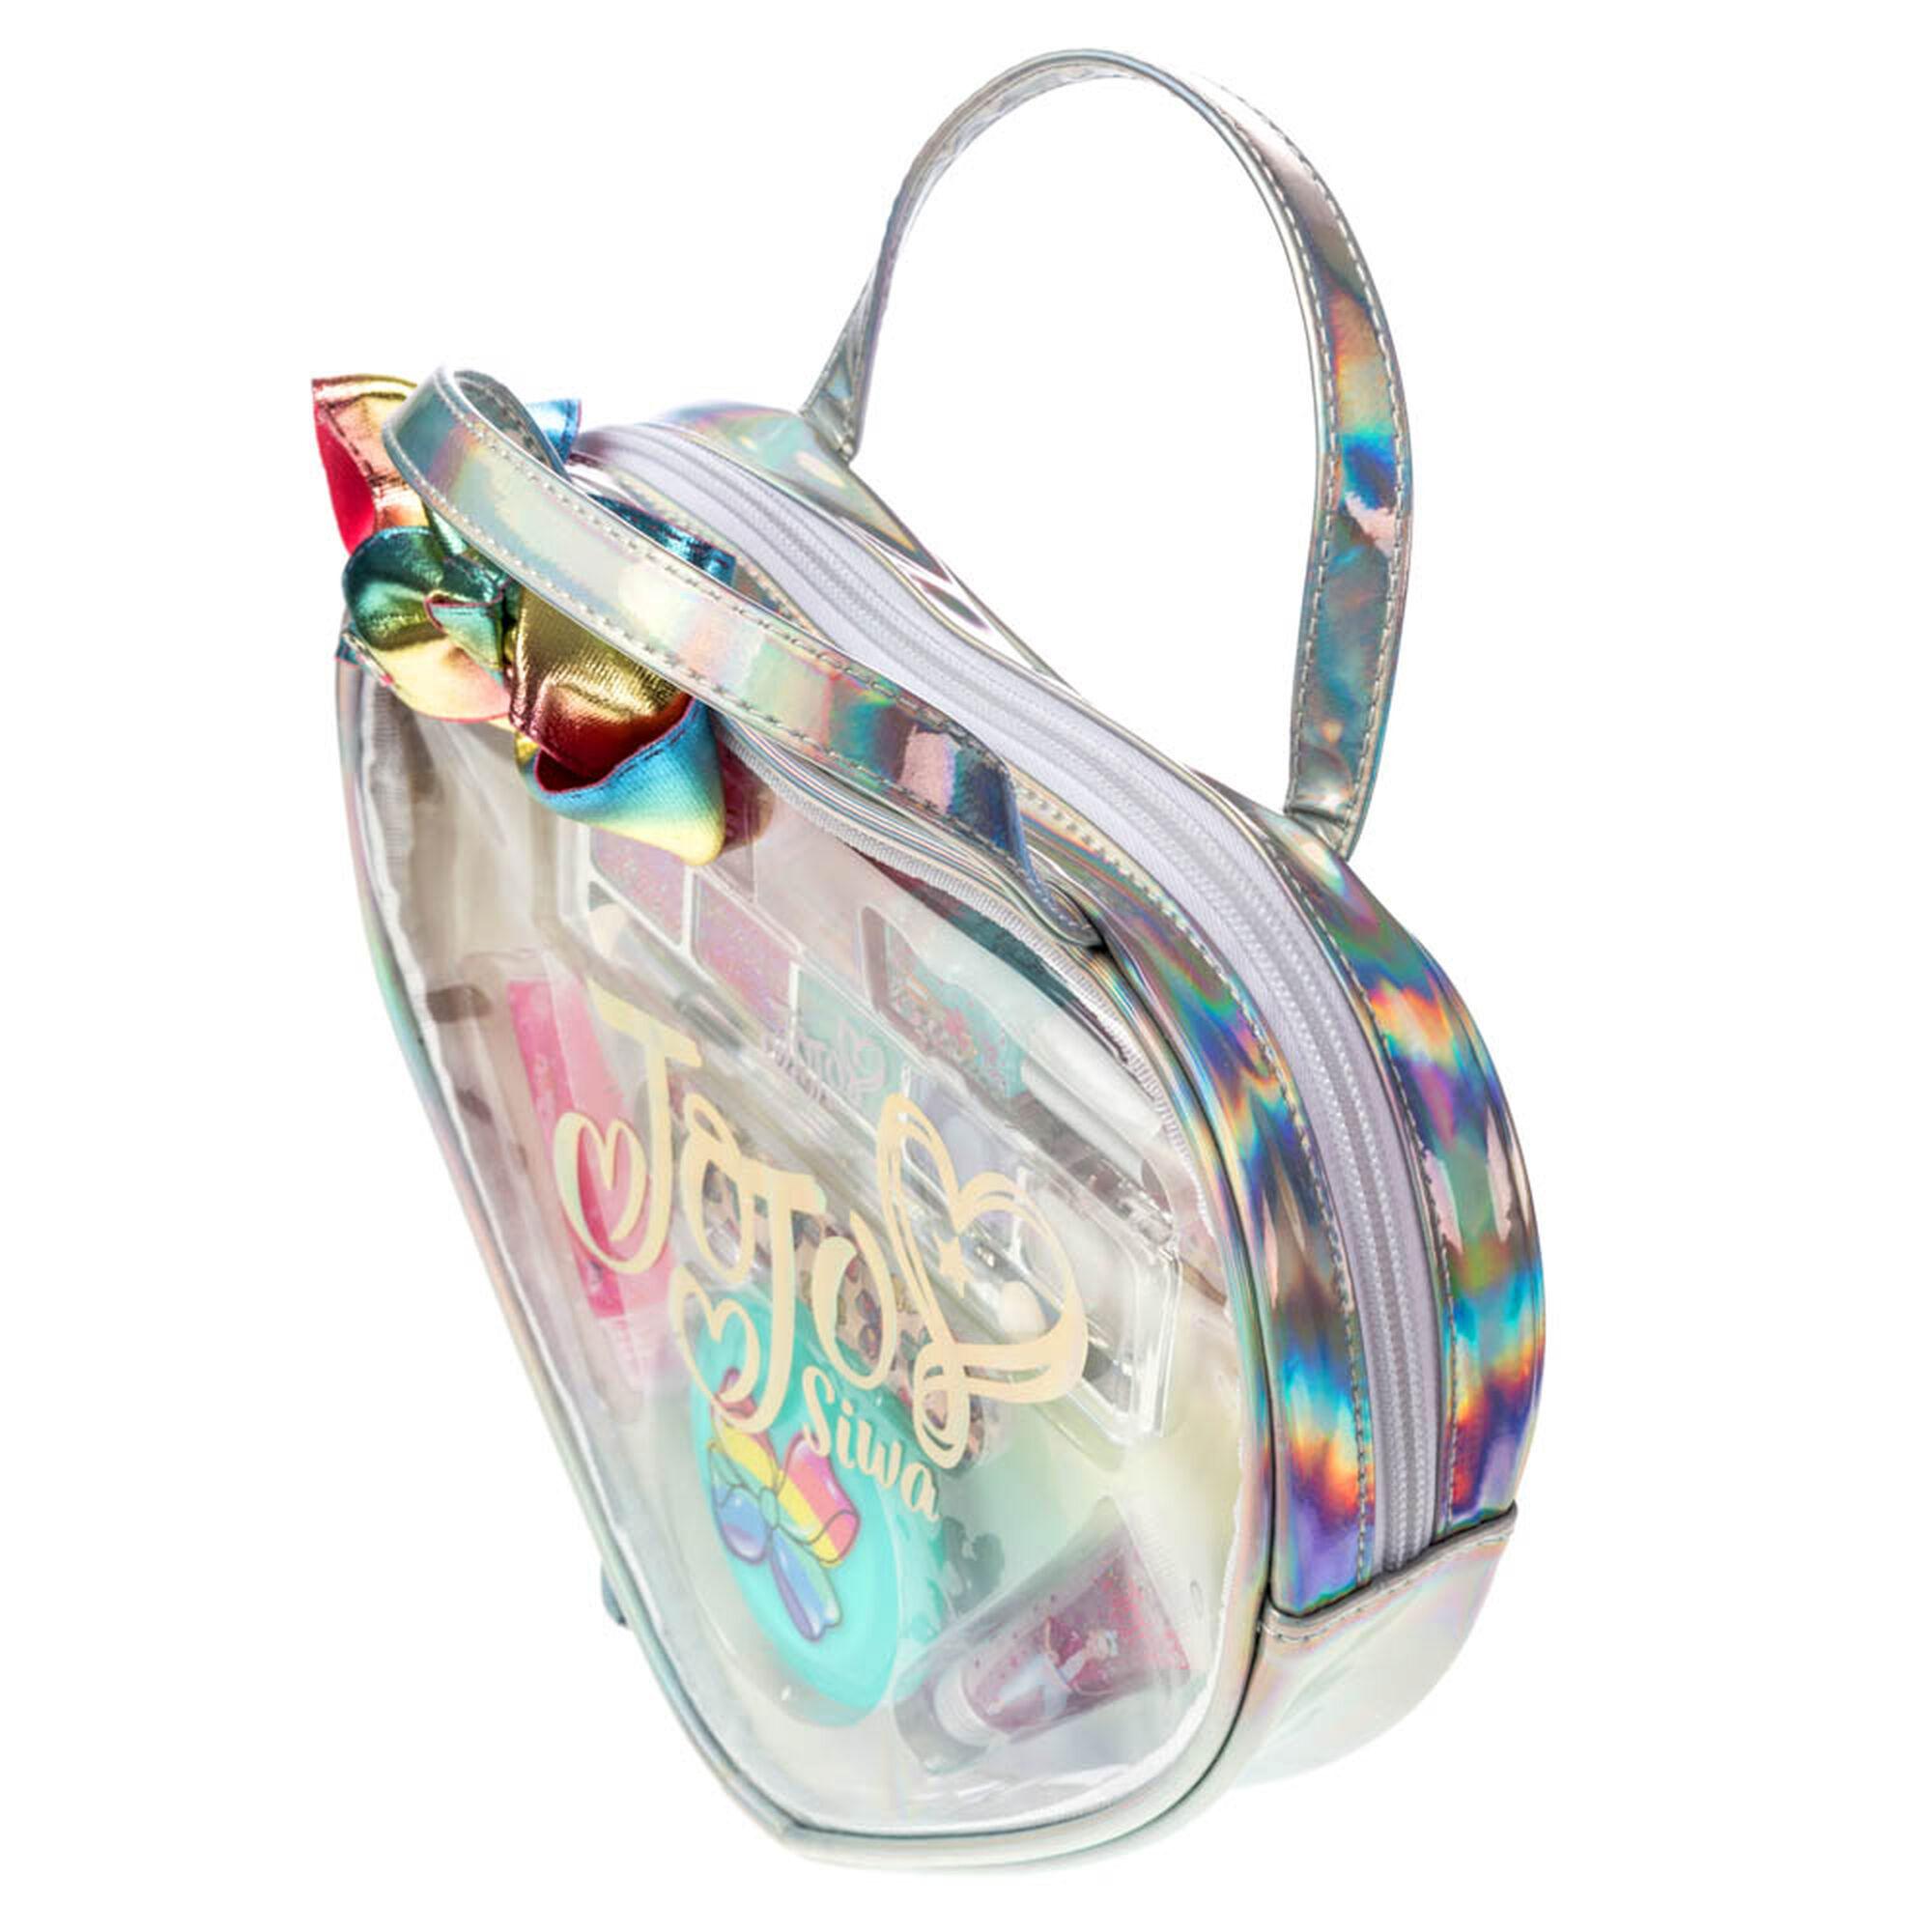 JoJo Siwa™ Heart-Shaped Holographic Cosmetic Bag with ...